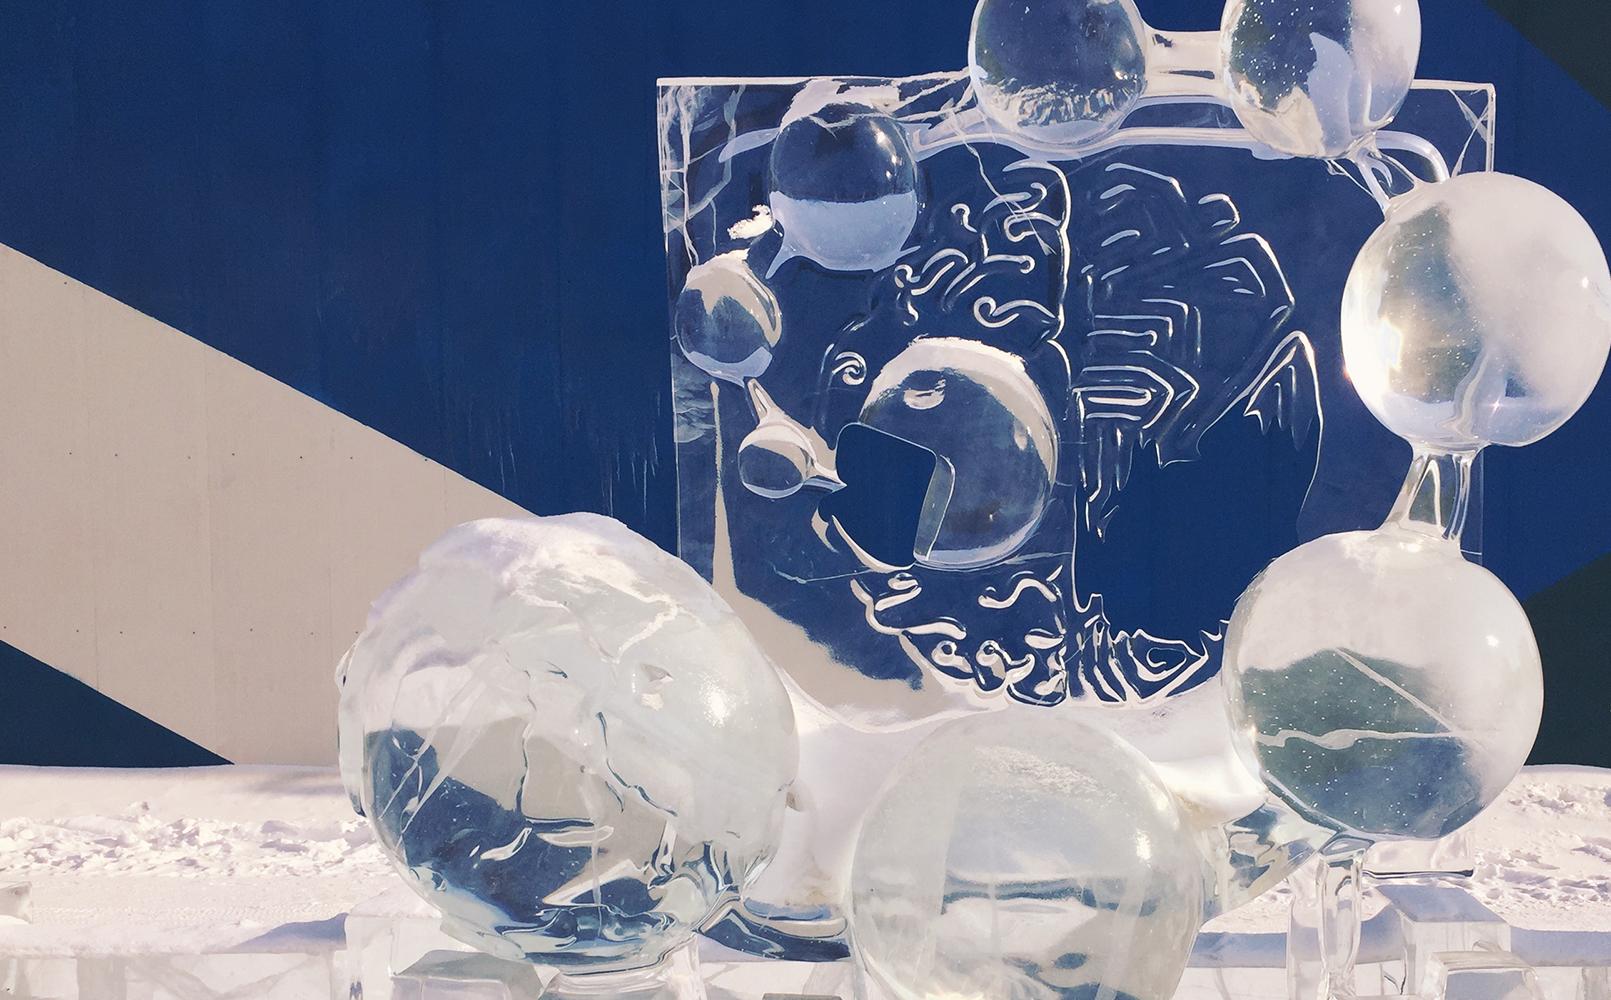 pacman ice